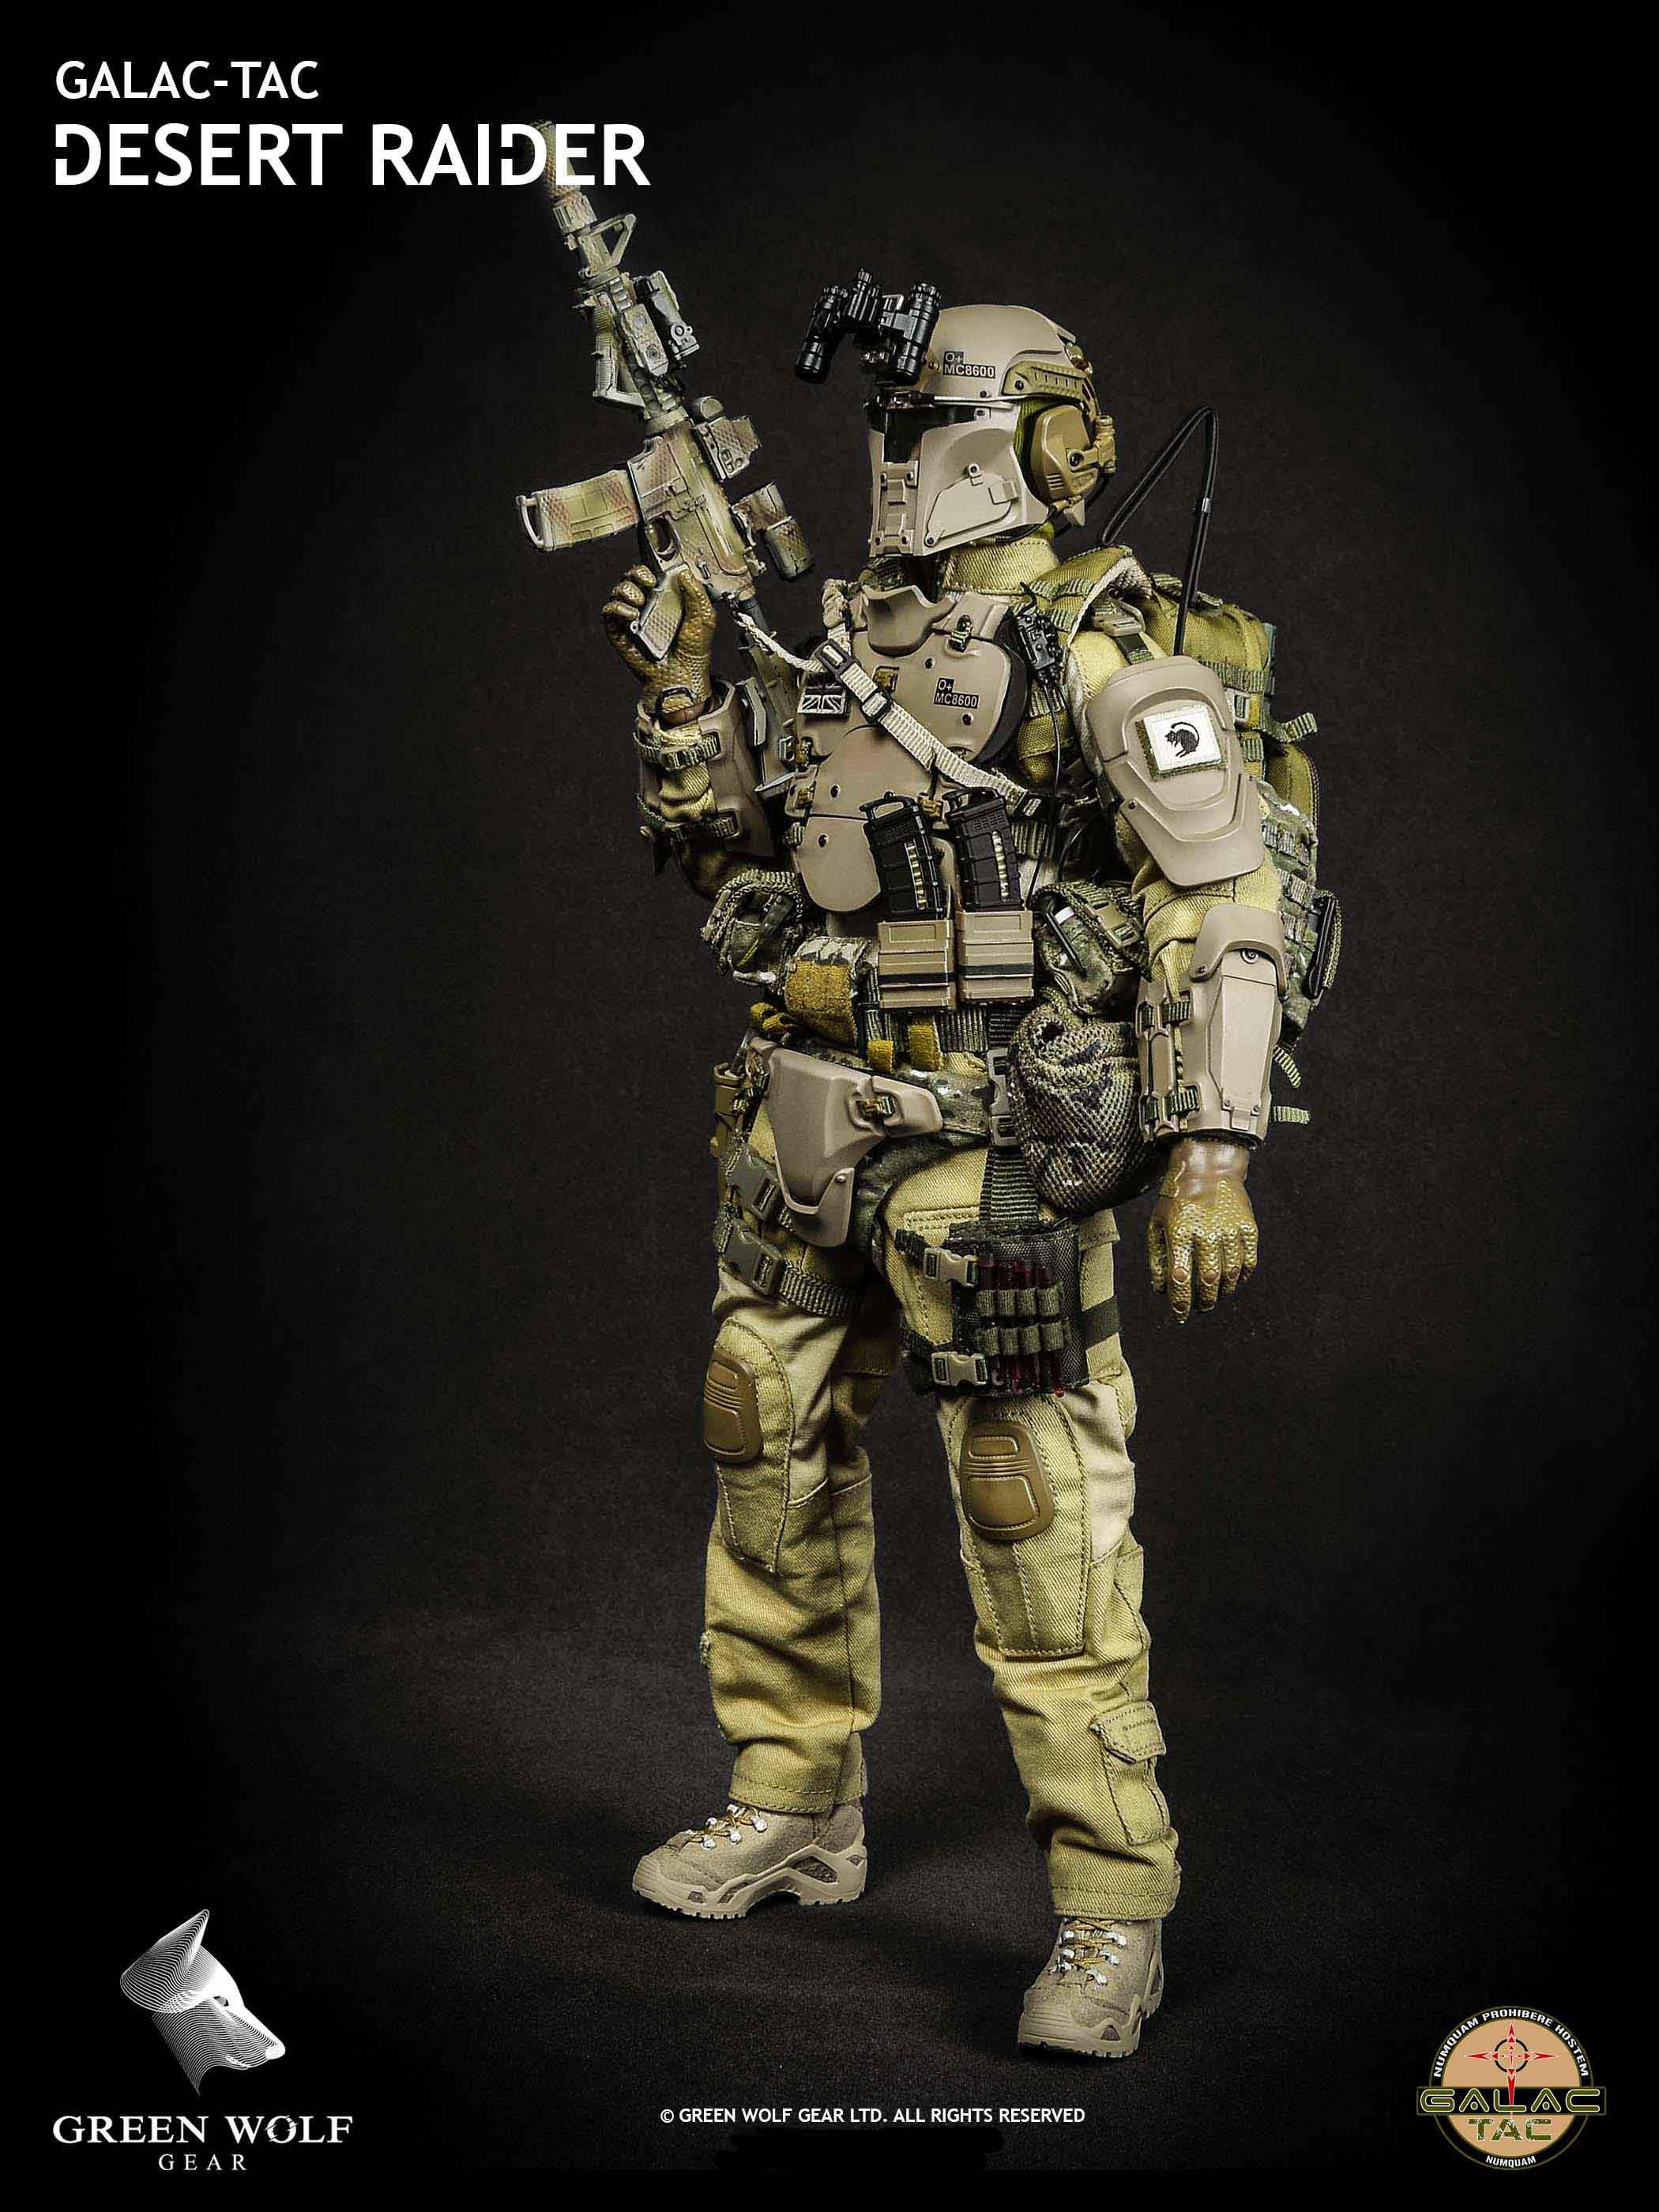 Green Wolf Gear GWG-004 Desert Raider - GALAC-TAC armour inspired.